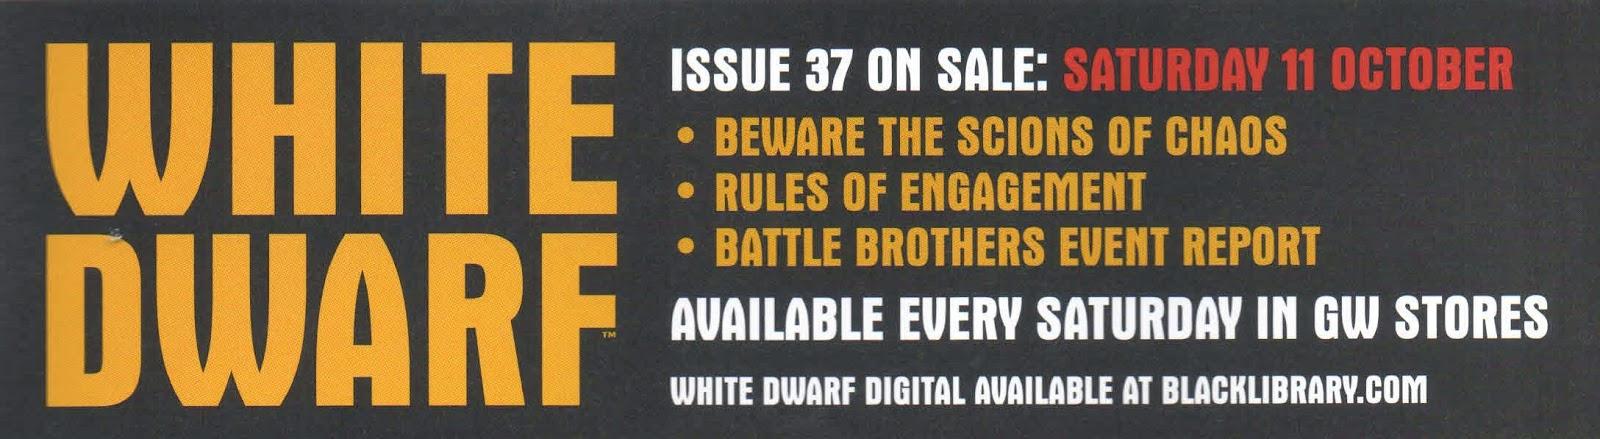 Adelanto de la White Dwarf Weekly número 37